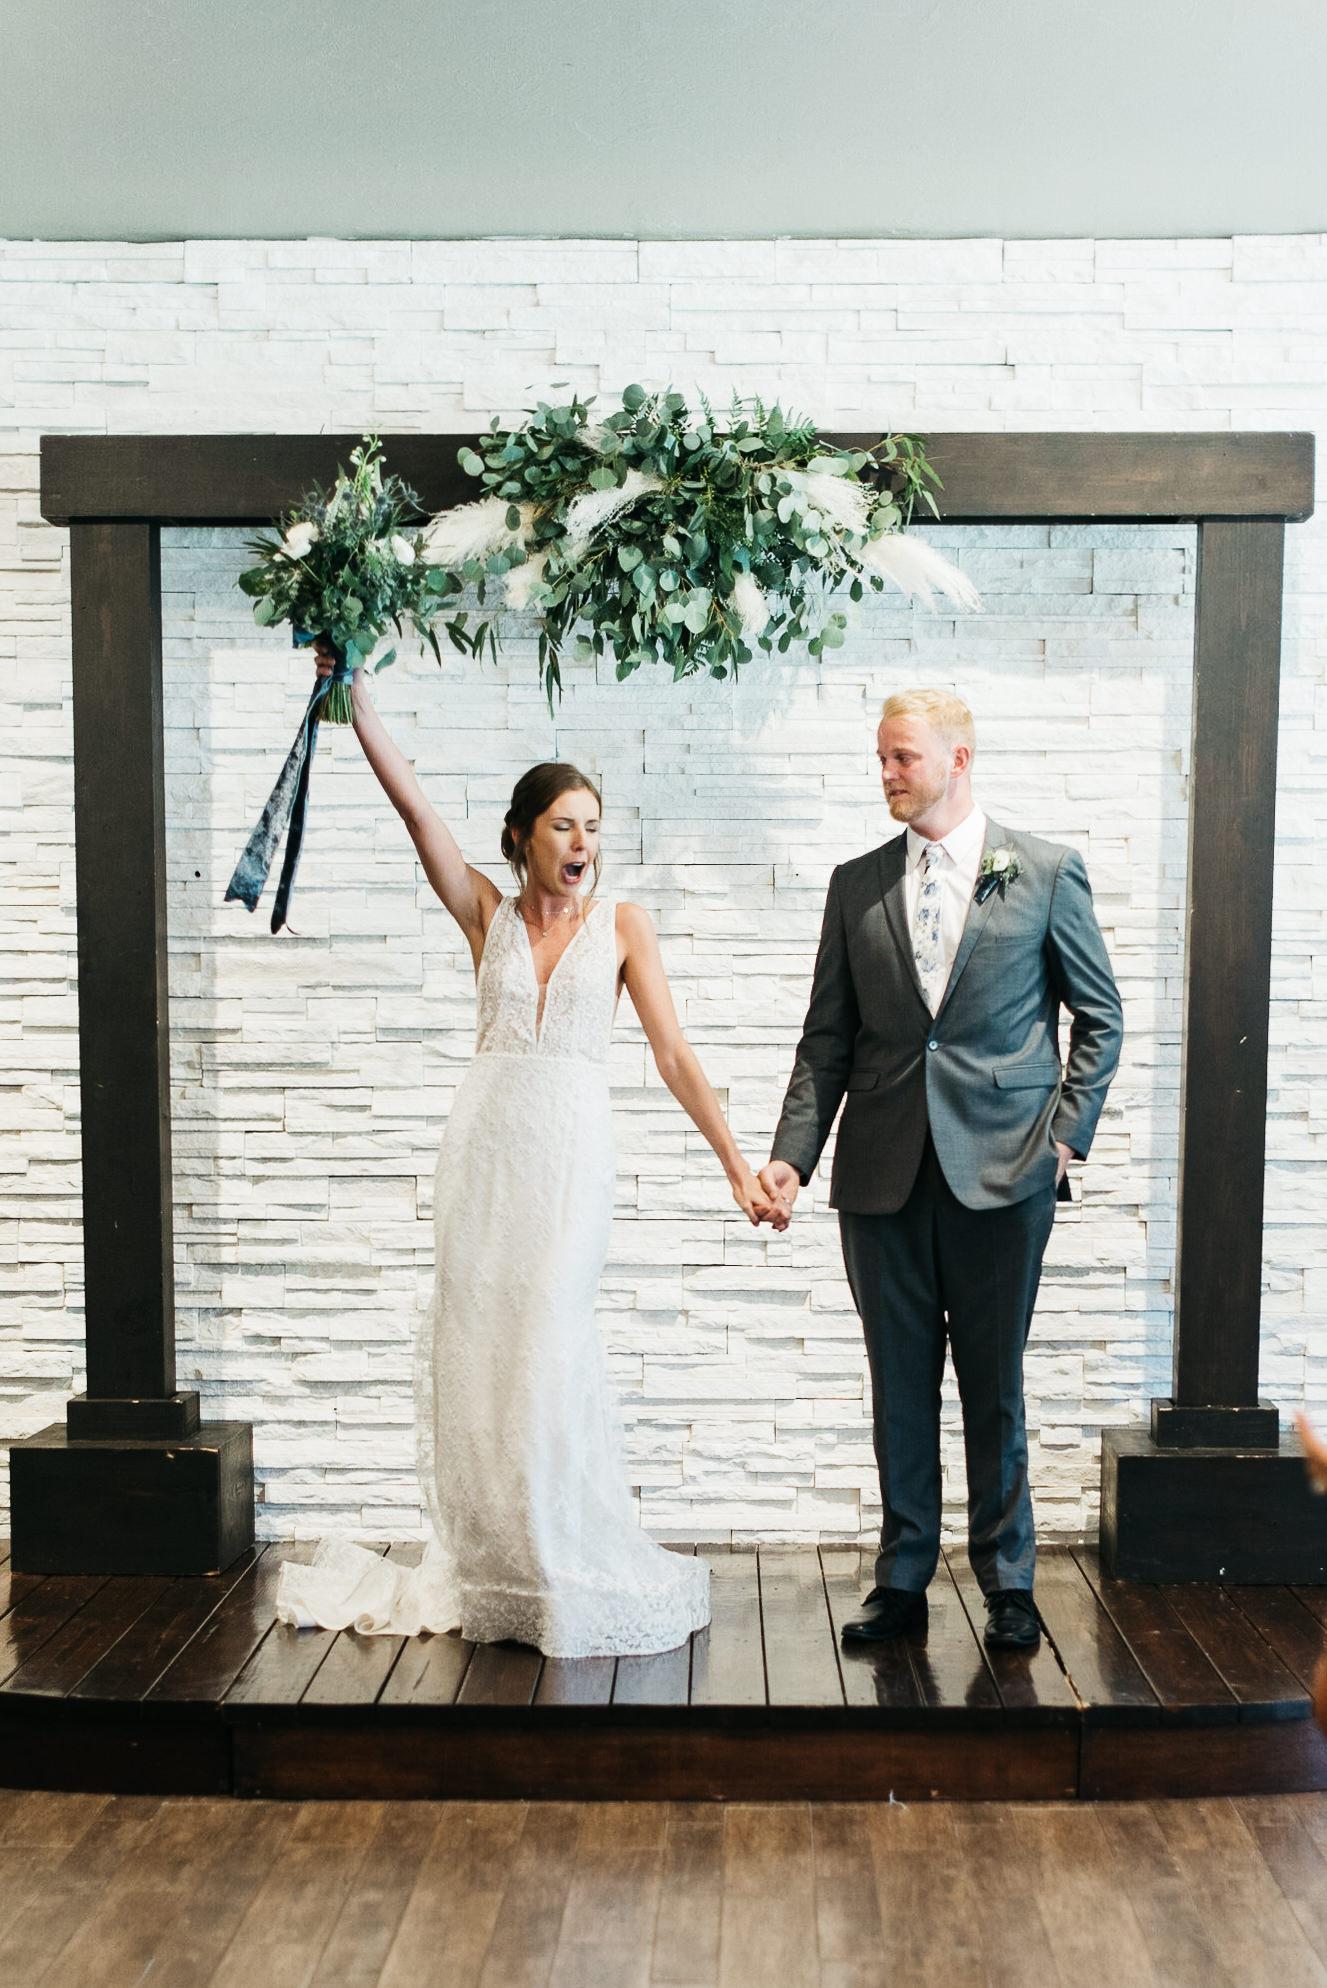 okc-wedding-photographer-coles-garden-wedding-okc-best-wedding-photographers-126.jpg